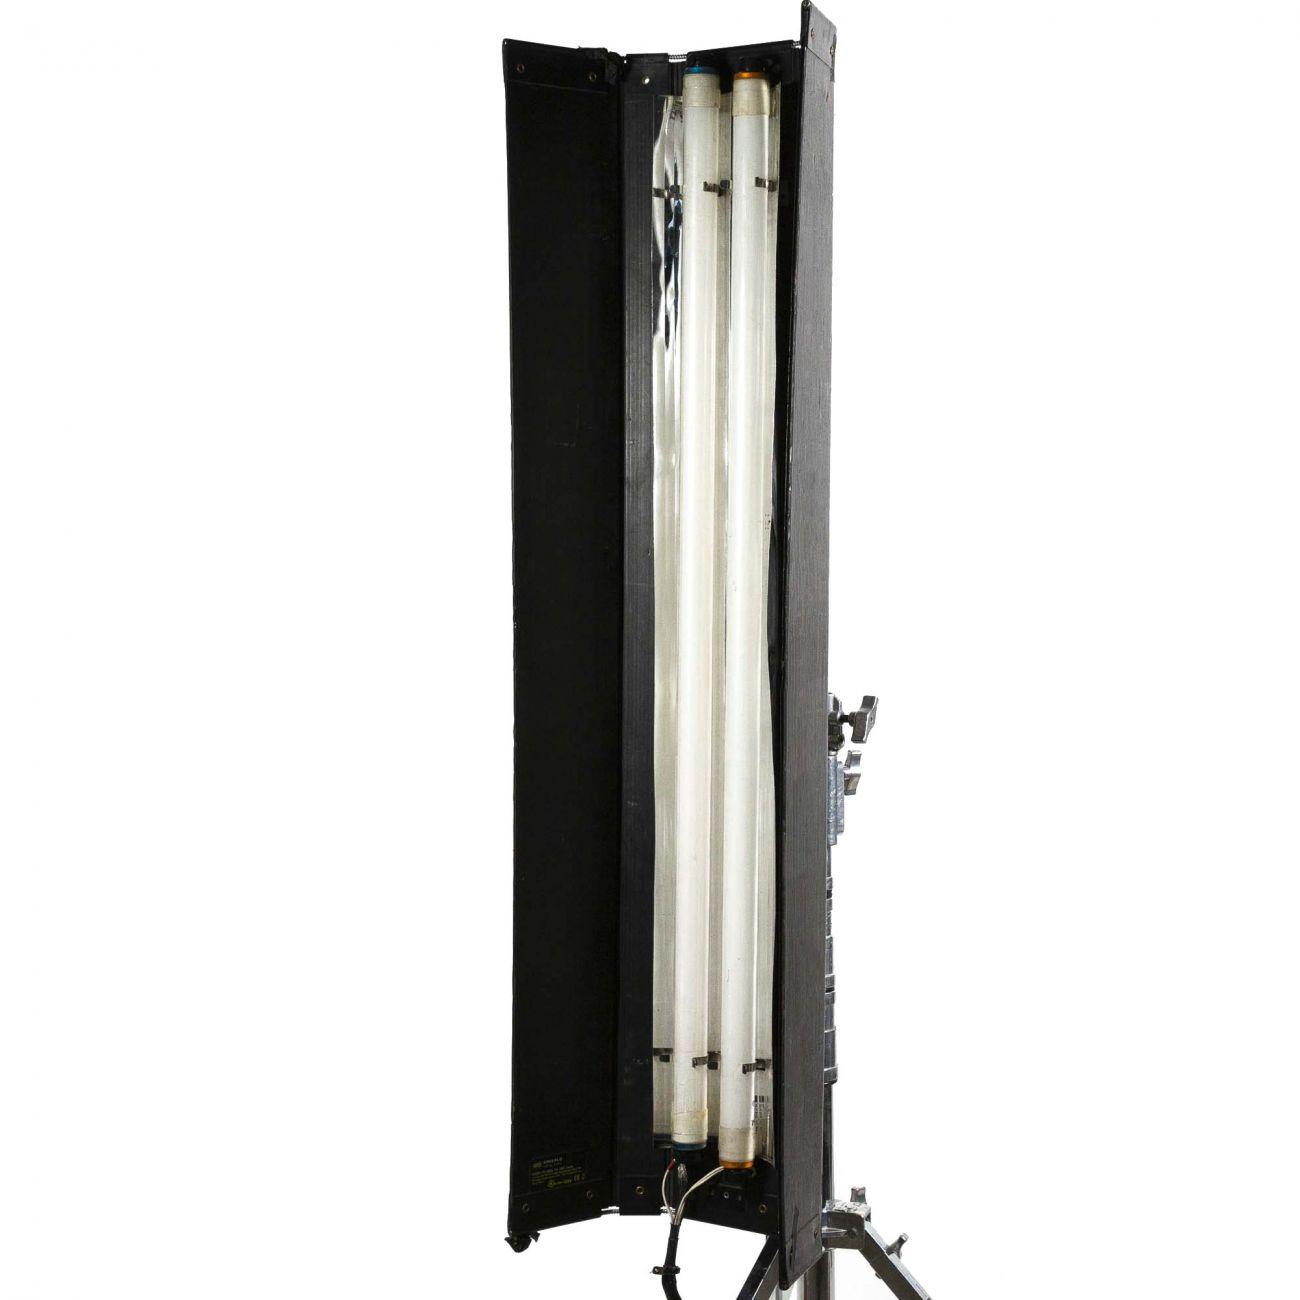 KinoFlo 4ft x 2 lamps